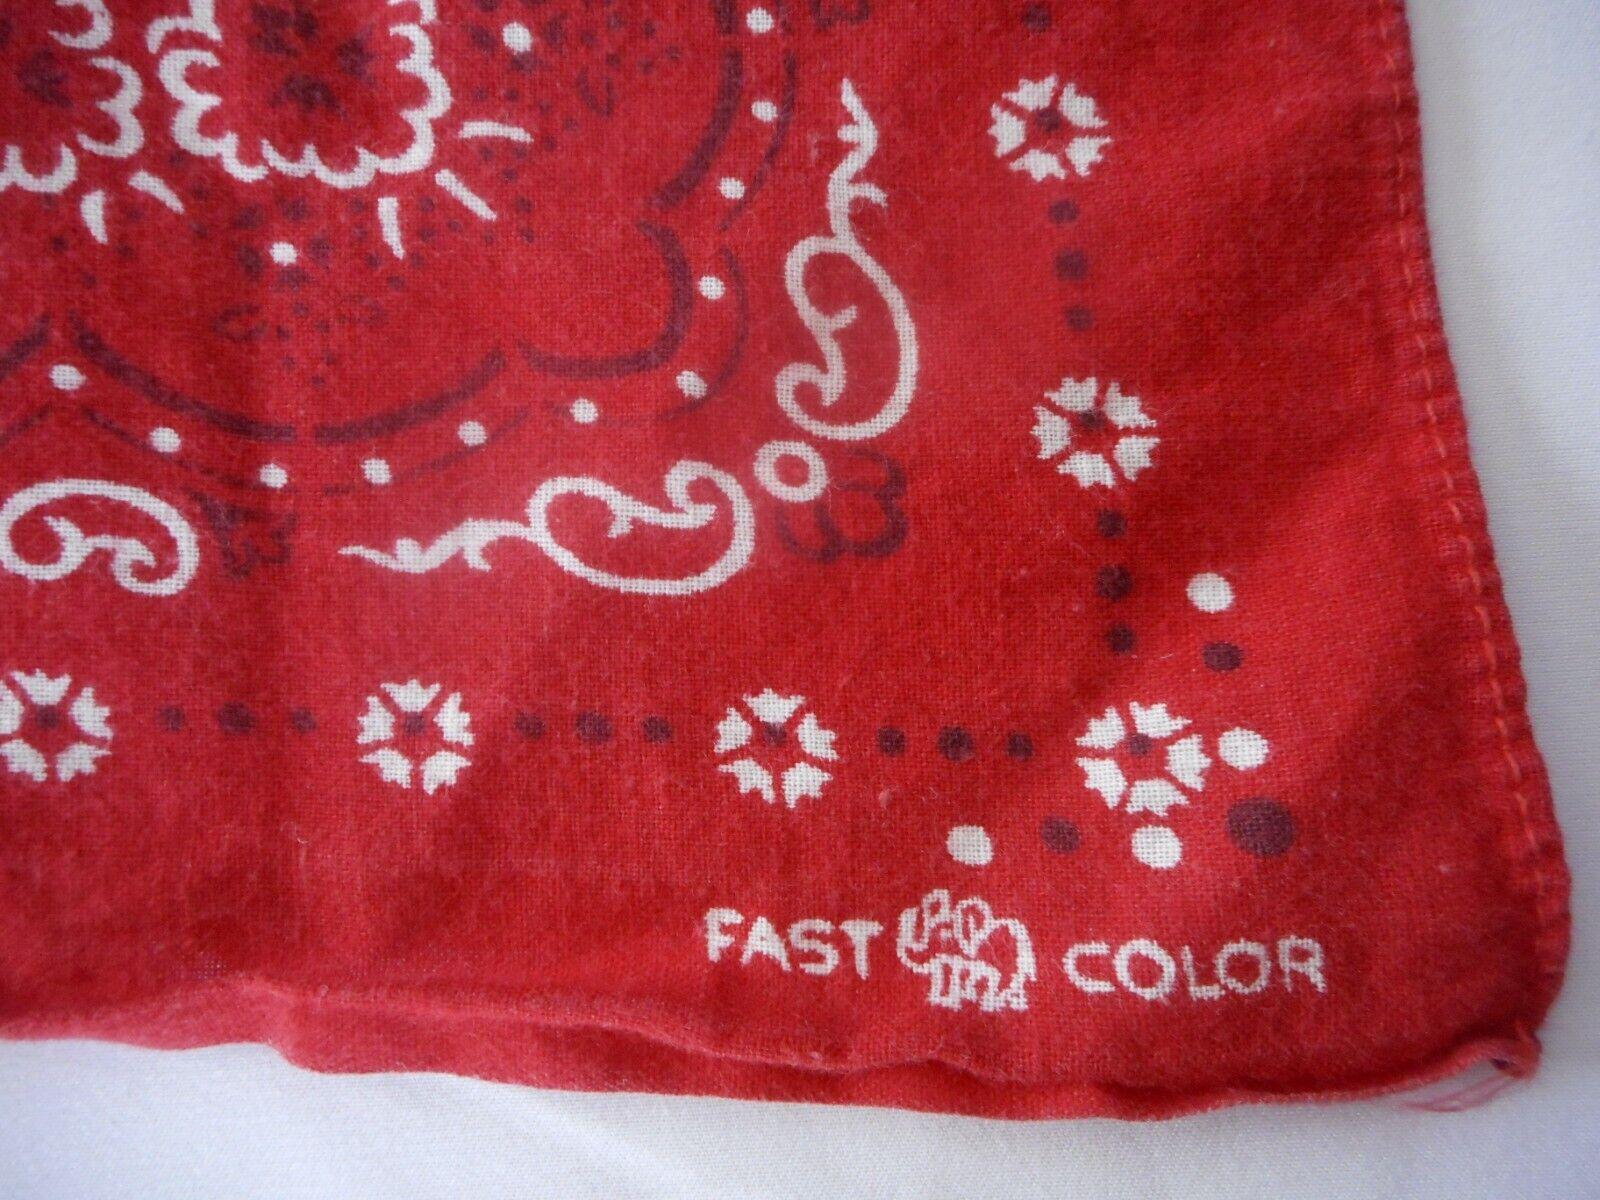 Rare Vintage Red Fast Color Trunk Up Bandana Old Time Workwear Cowboy Range Wear